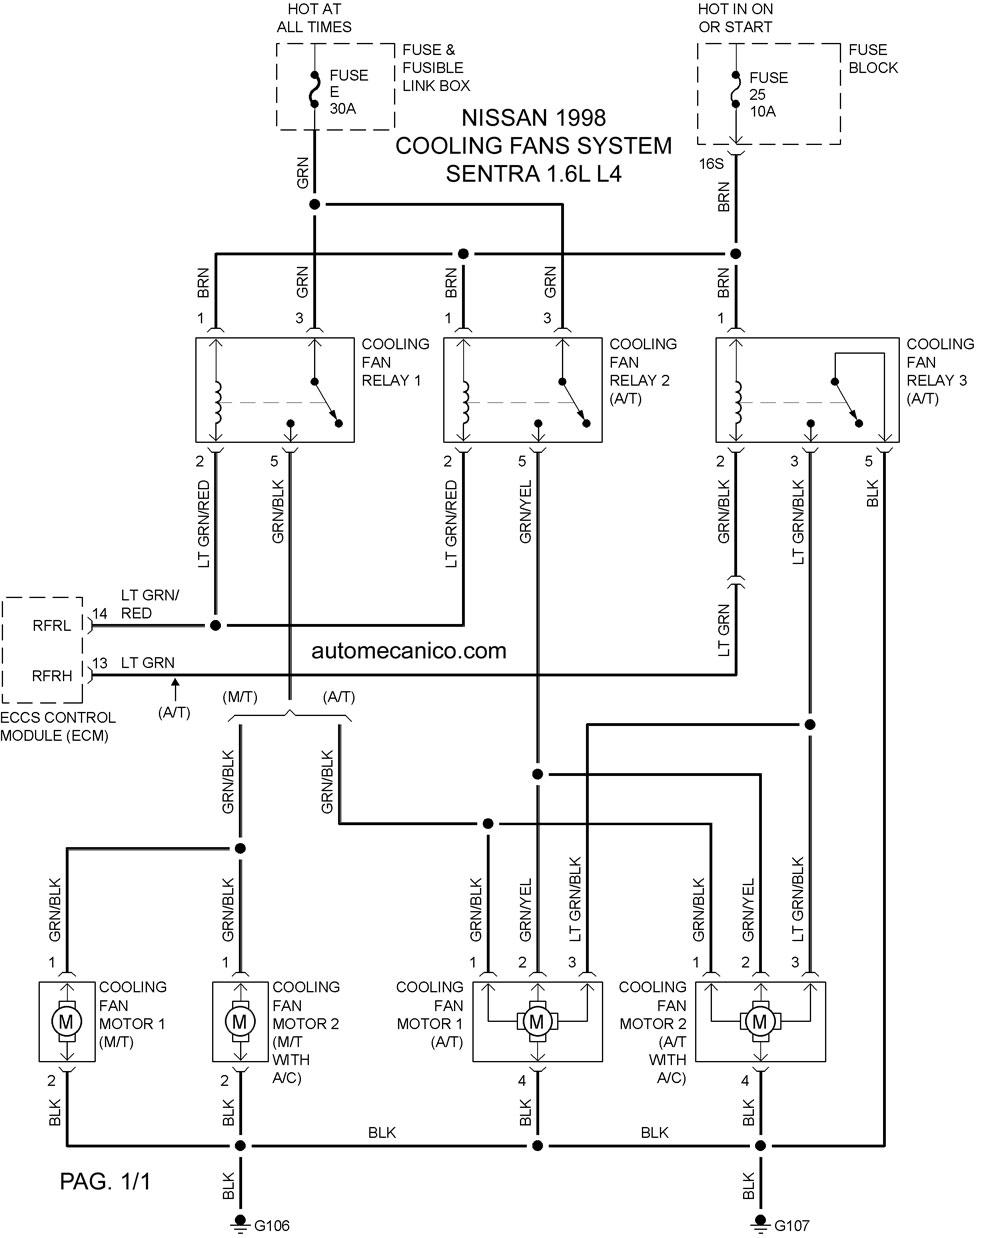 2005 Ford Focus Fuel System Diagram Nissan Cooling Fans System Diagramas Ventiladores